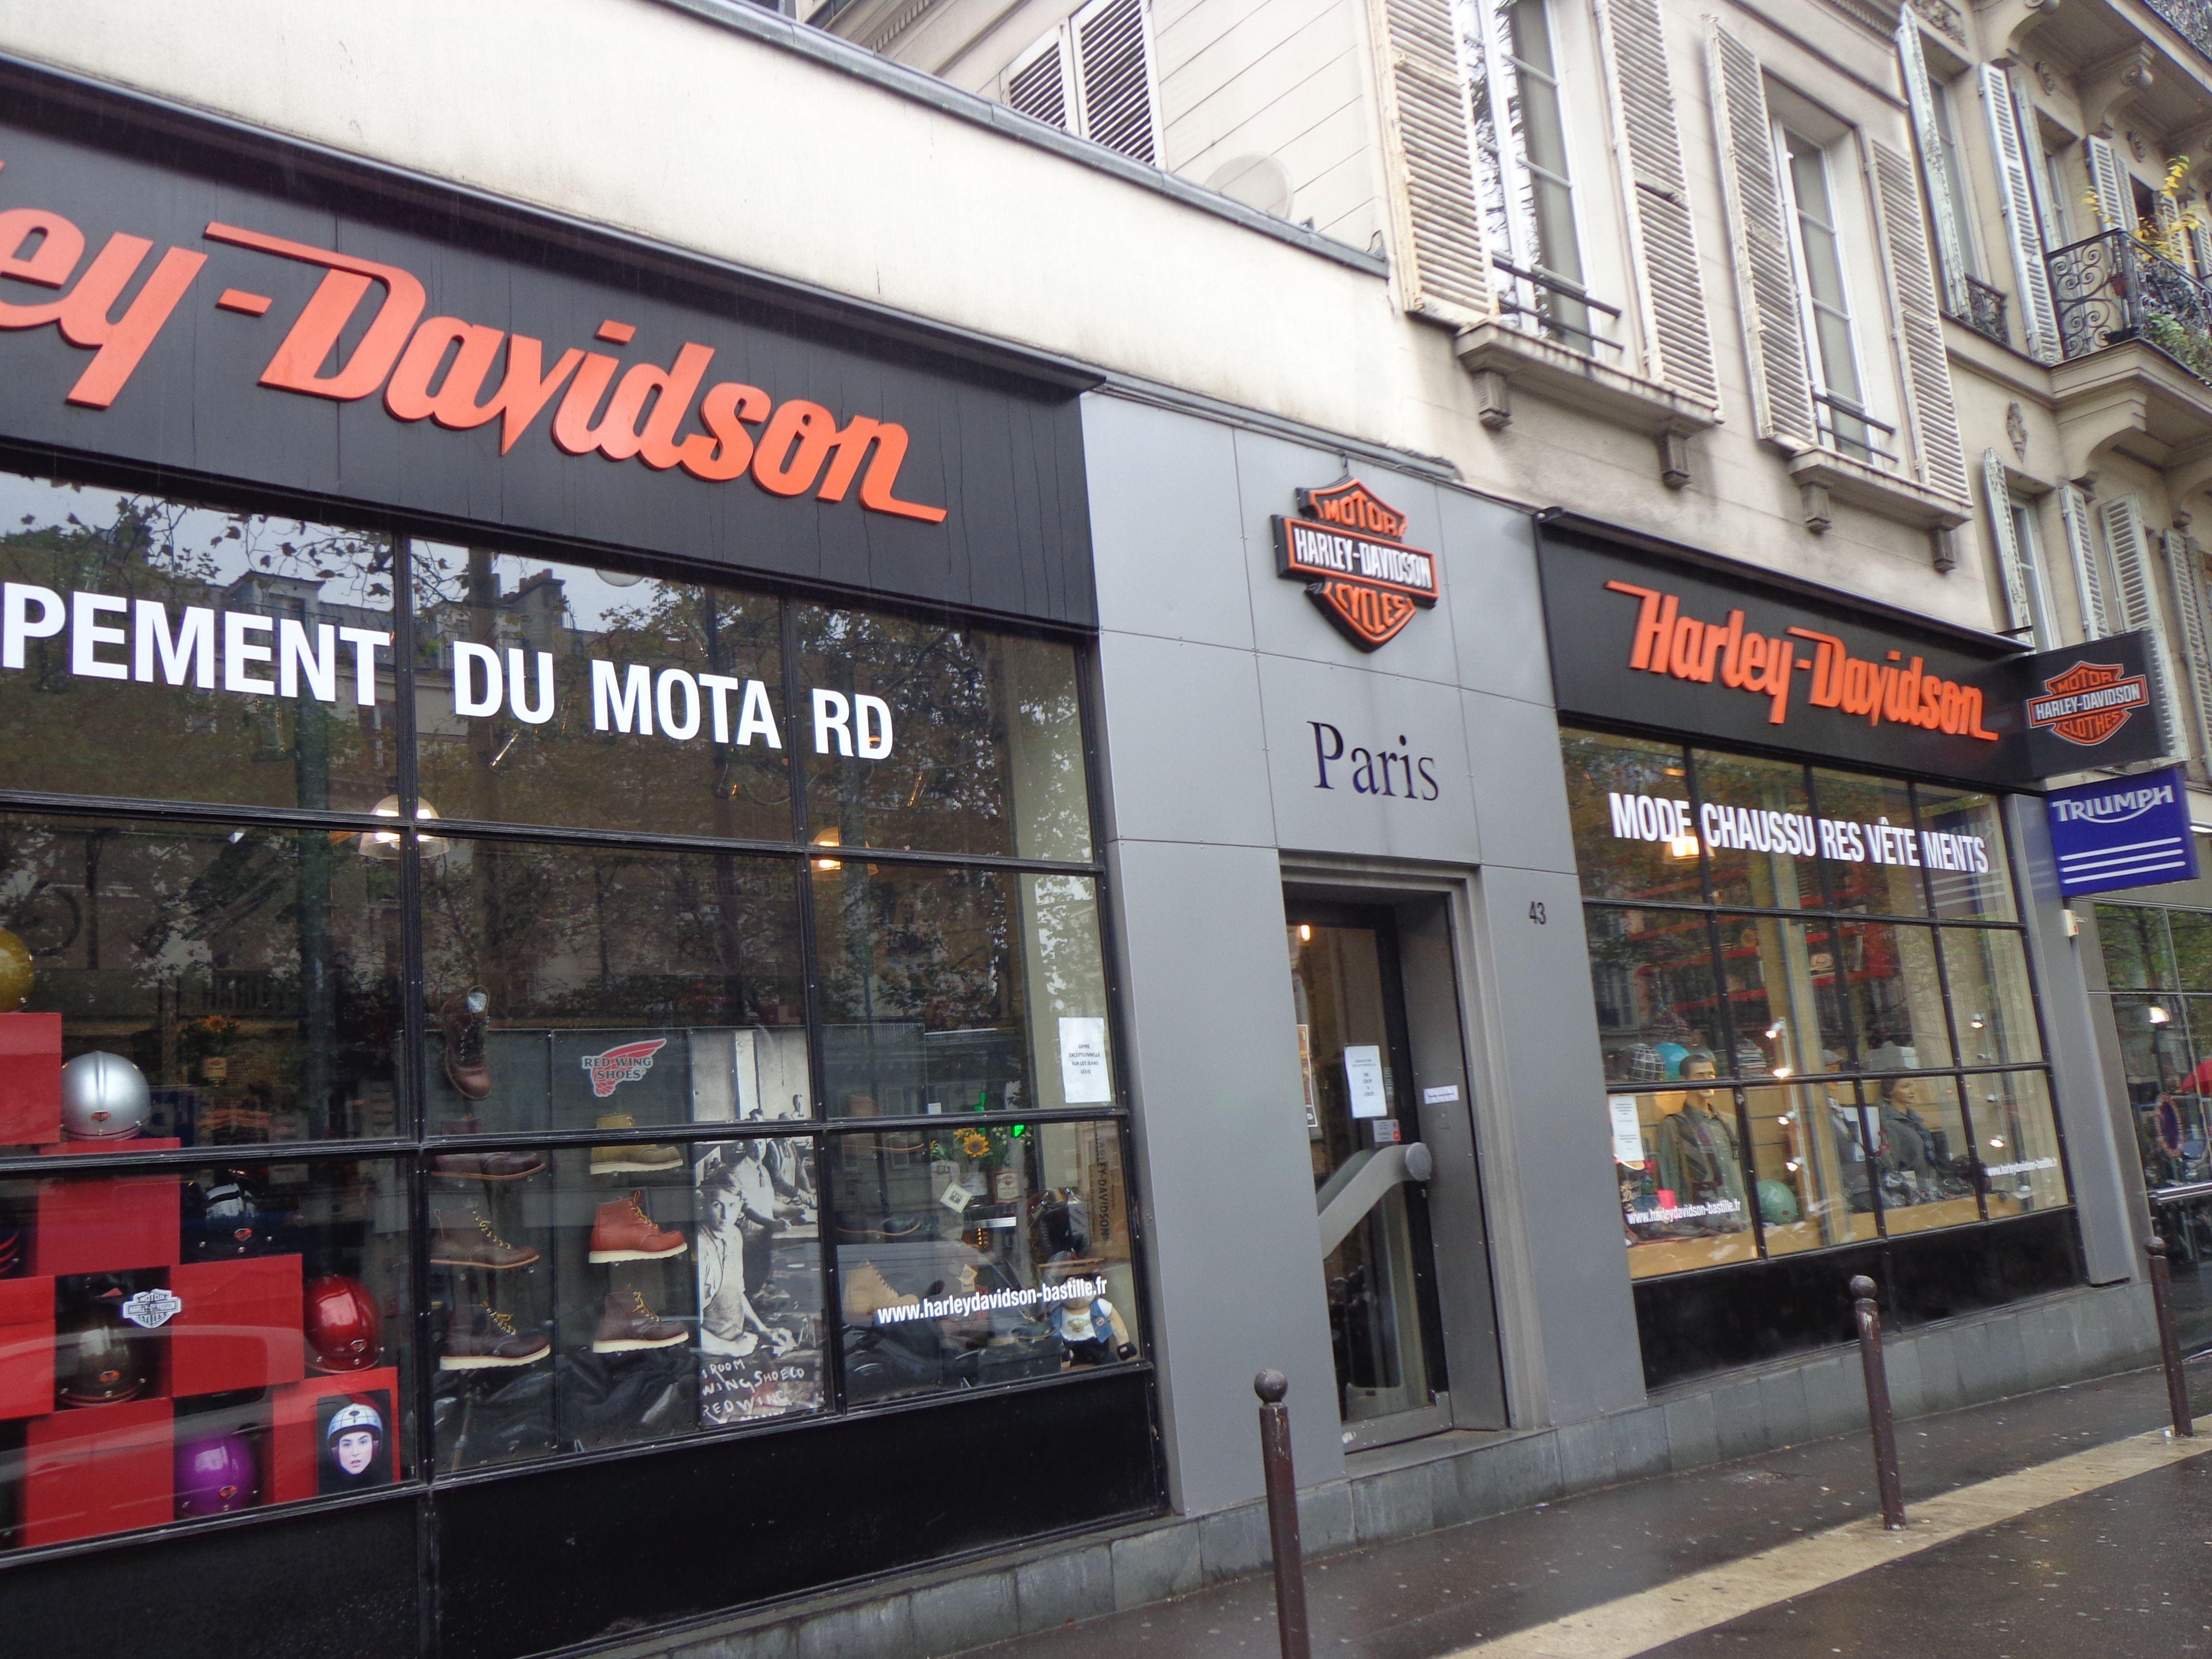 Harley Davidson in Paris